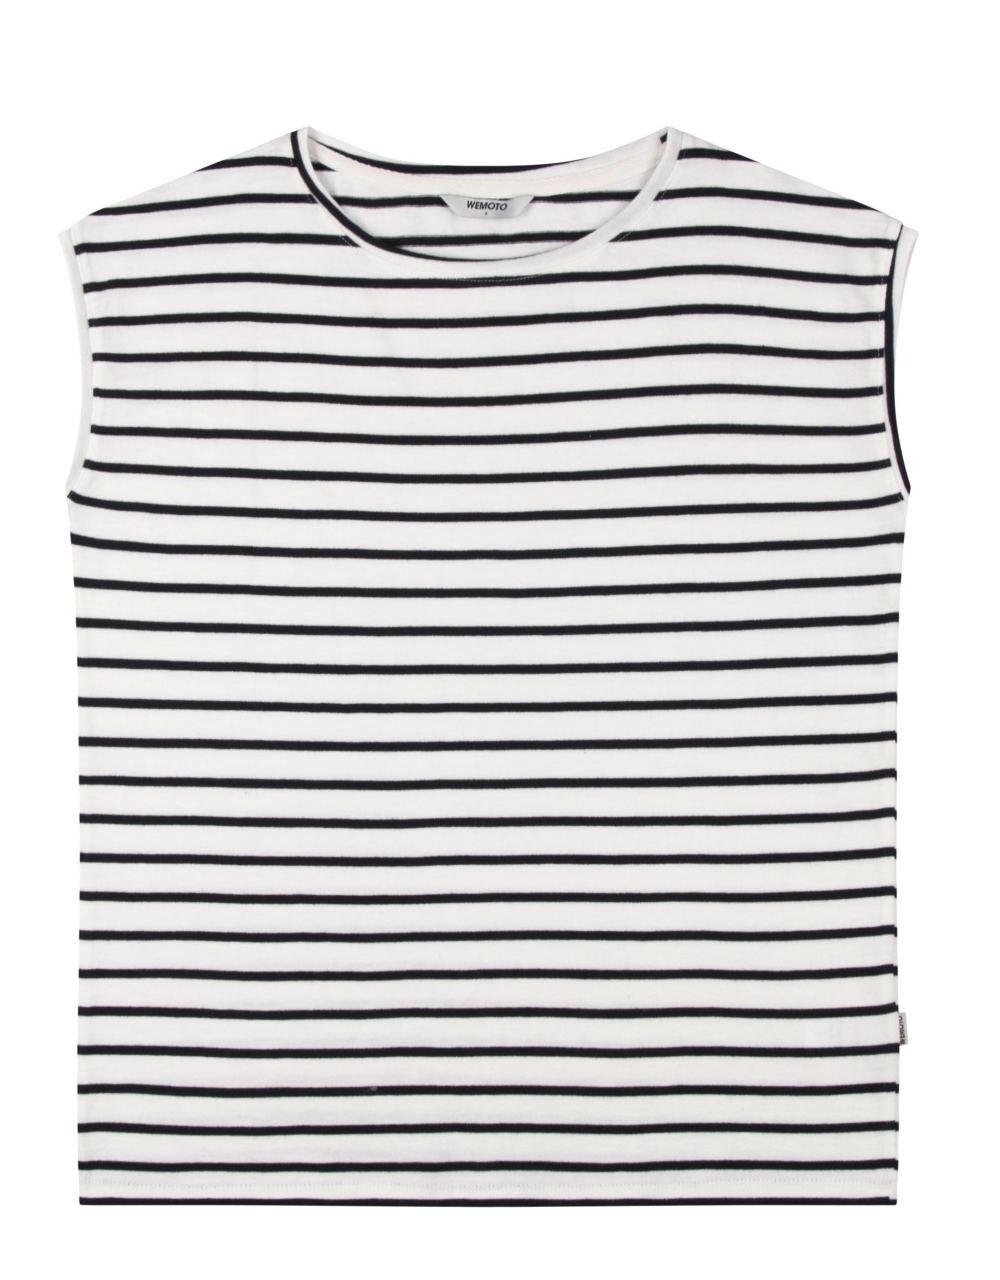 Solo Striped Shirt Black Off White